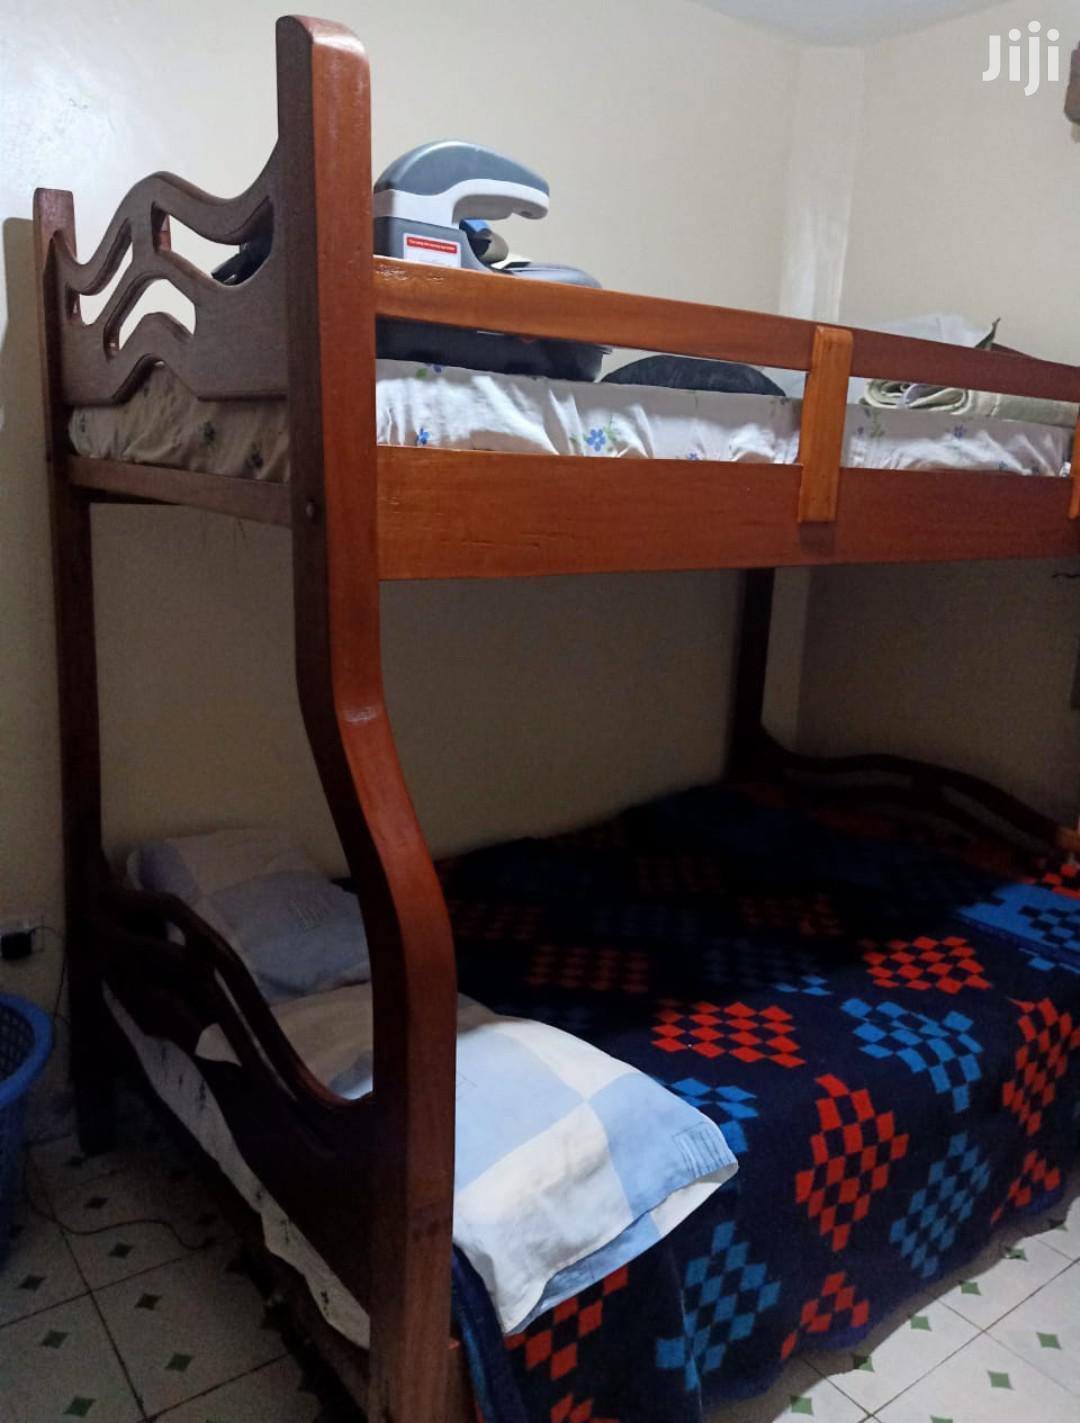 Mahogany Double Decker | Furniture for sale in Kasarani, Nairobi, Kenya